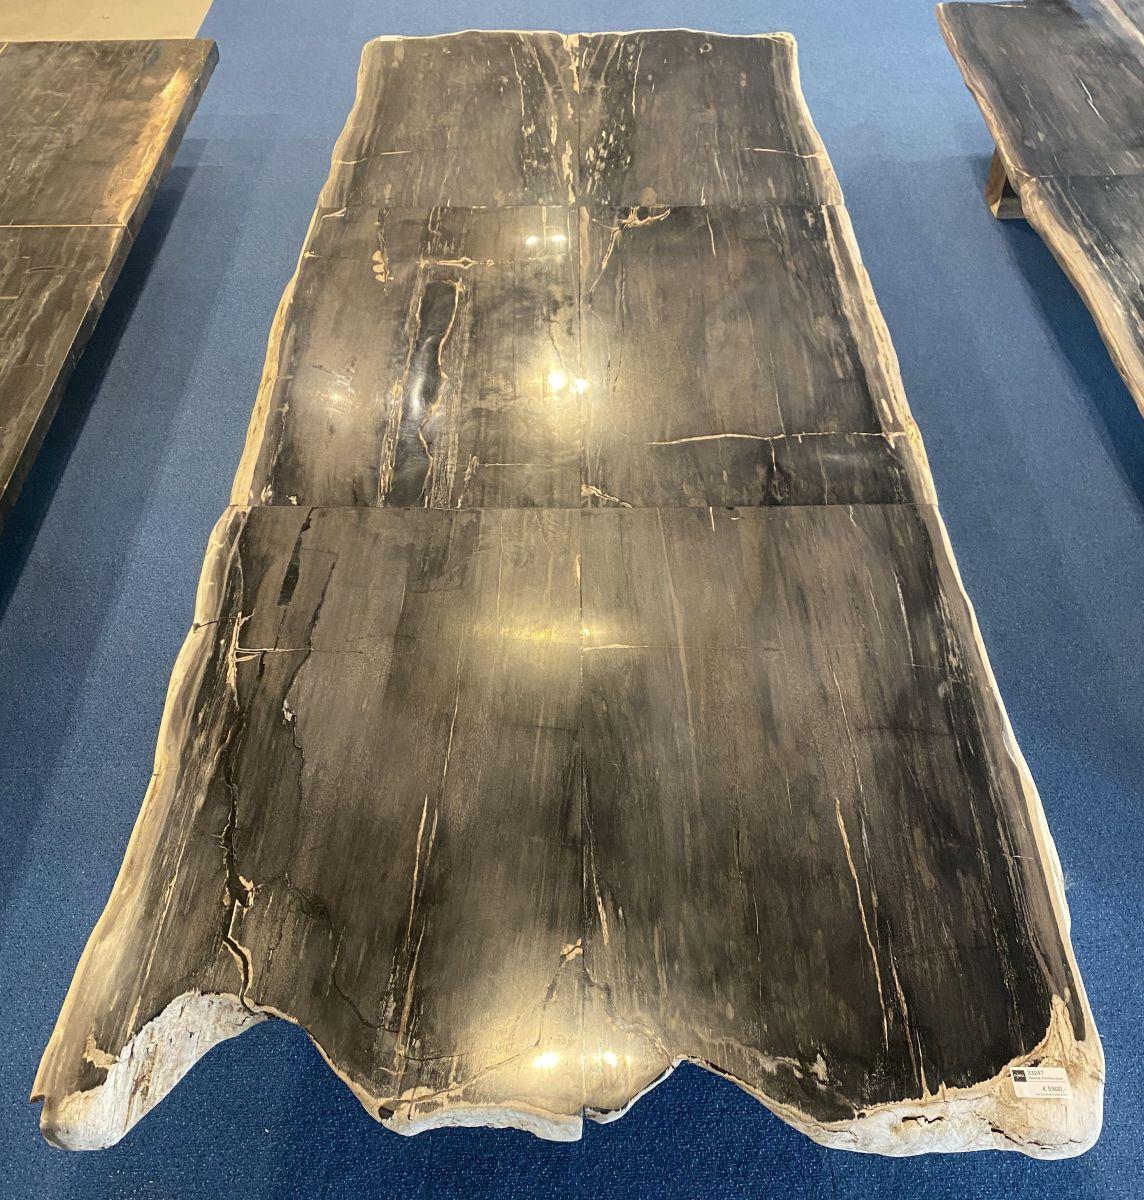 Table top petrified wood 33247